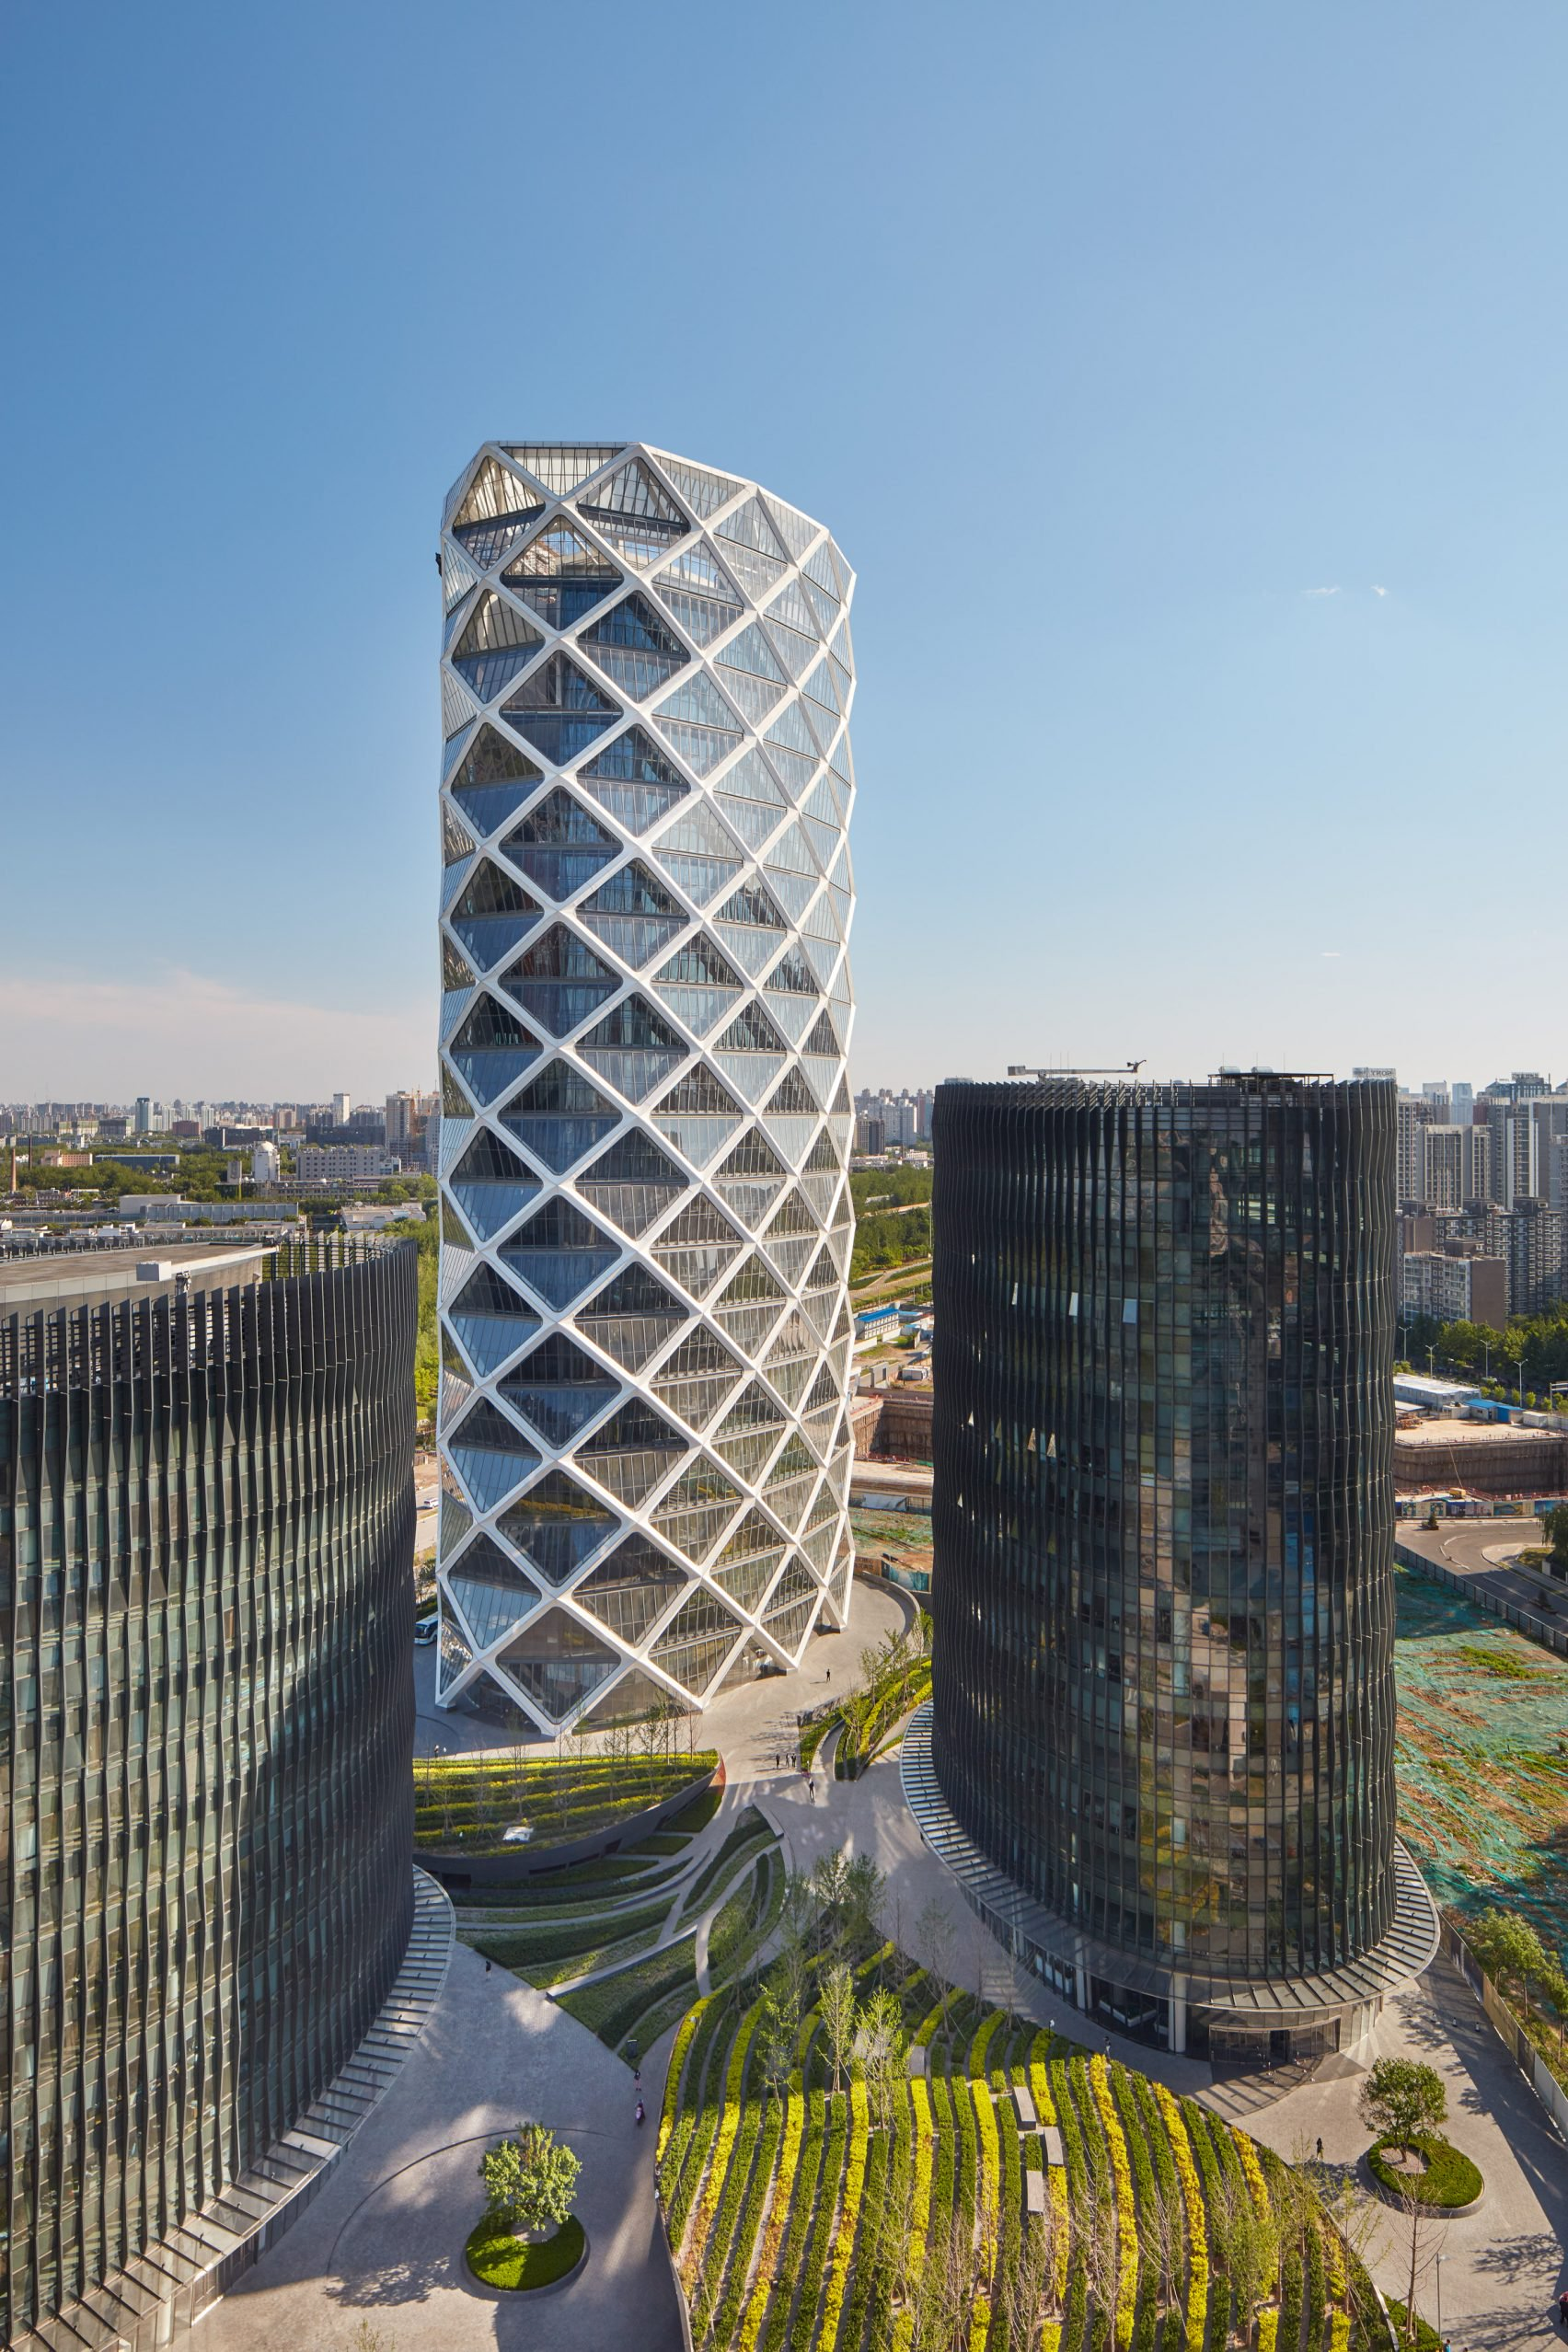 poly-international-plaza-som-architecture-beijing-china-towers_dezeen_2364_col_1-1-1704x2556.jpg